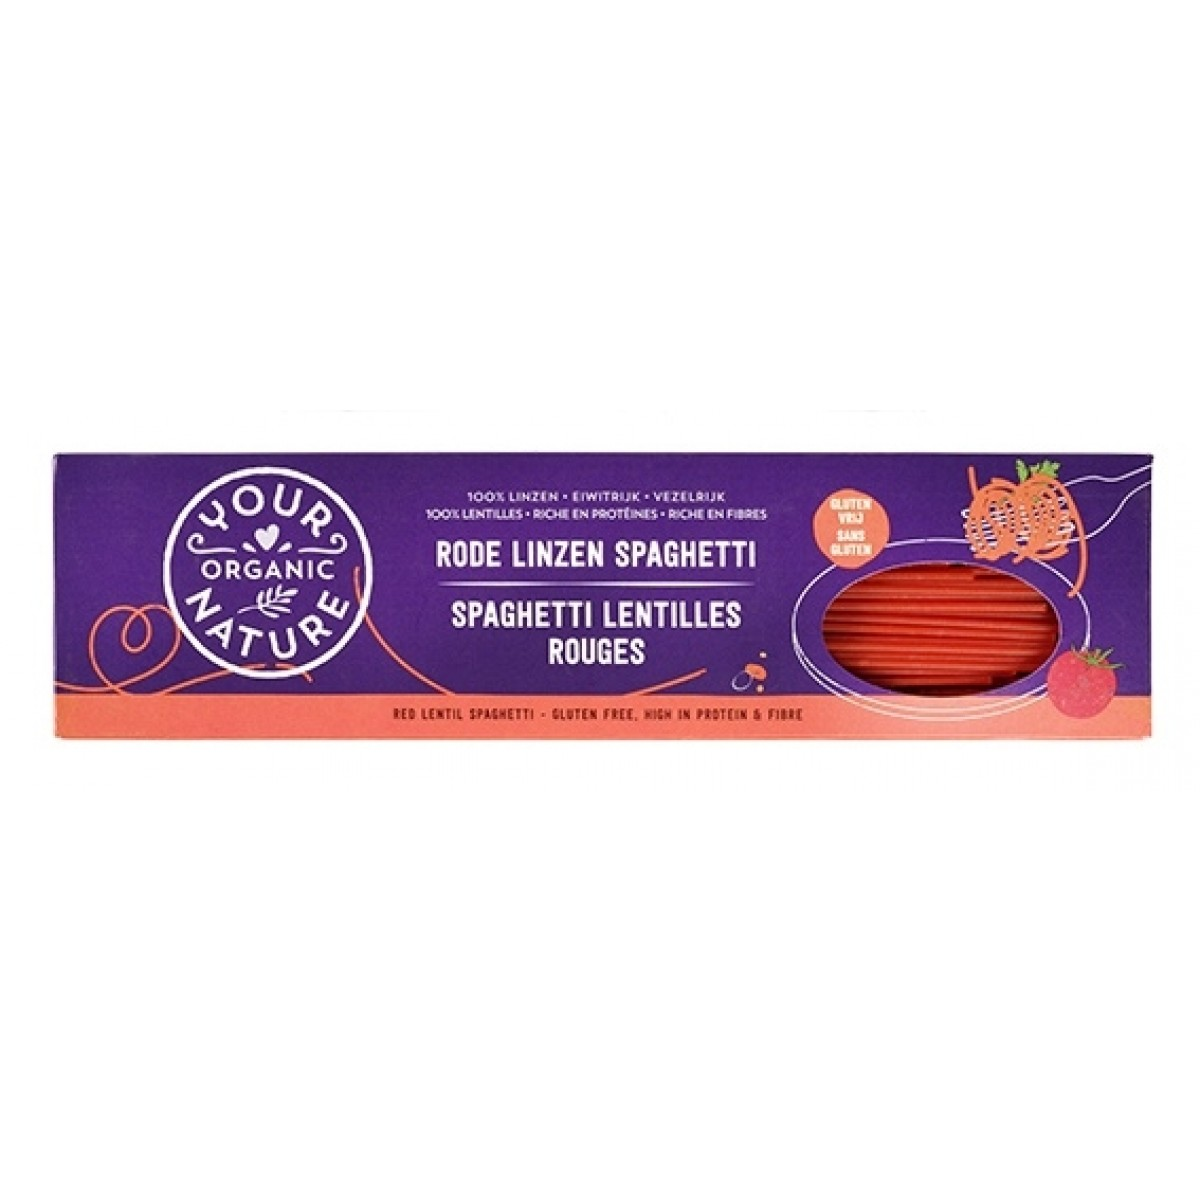 Rode Linzen Spaghetti